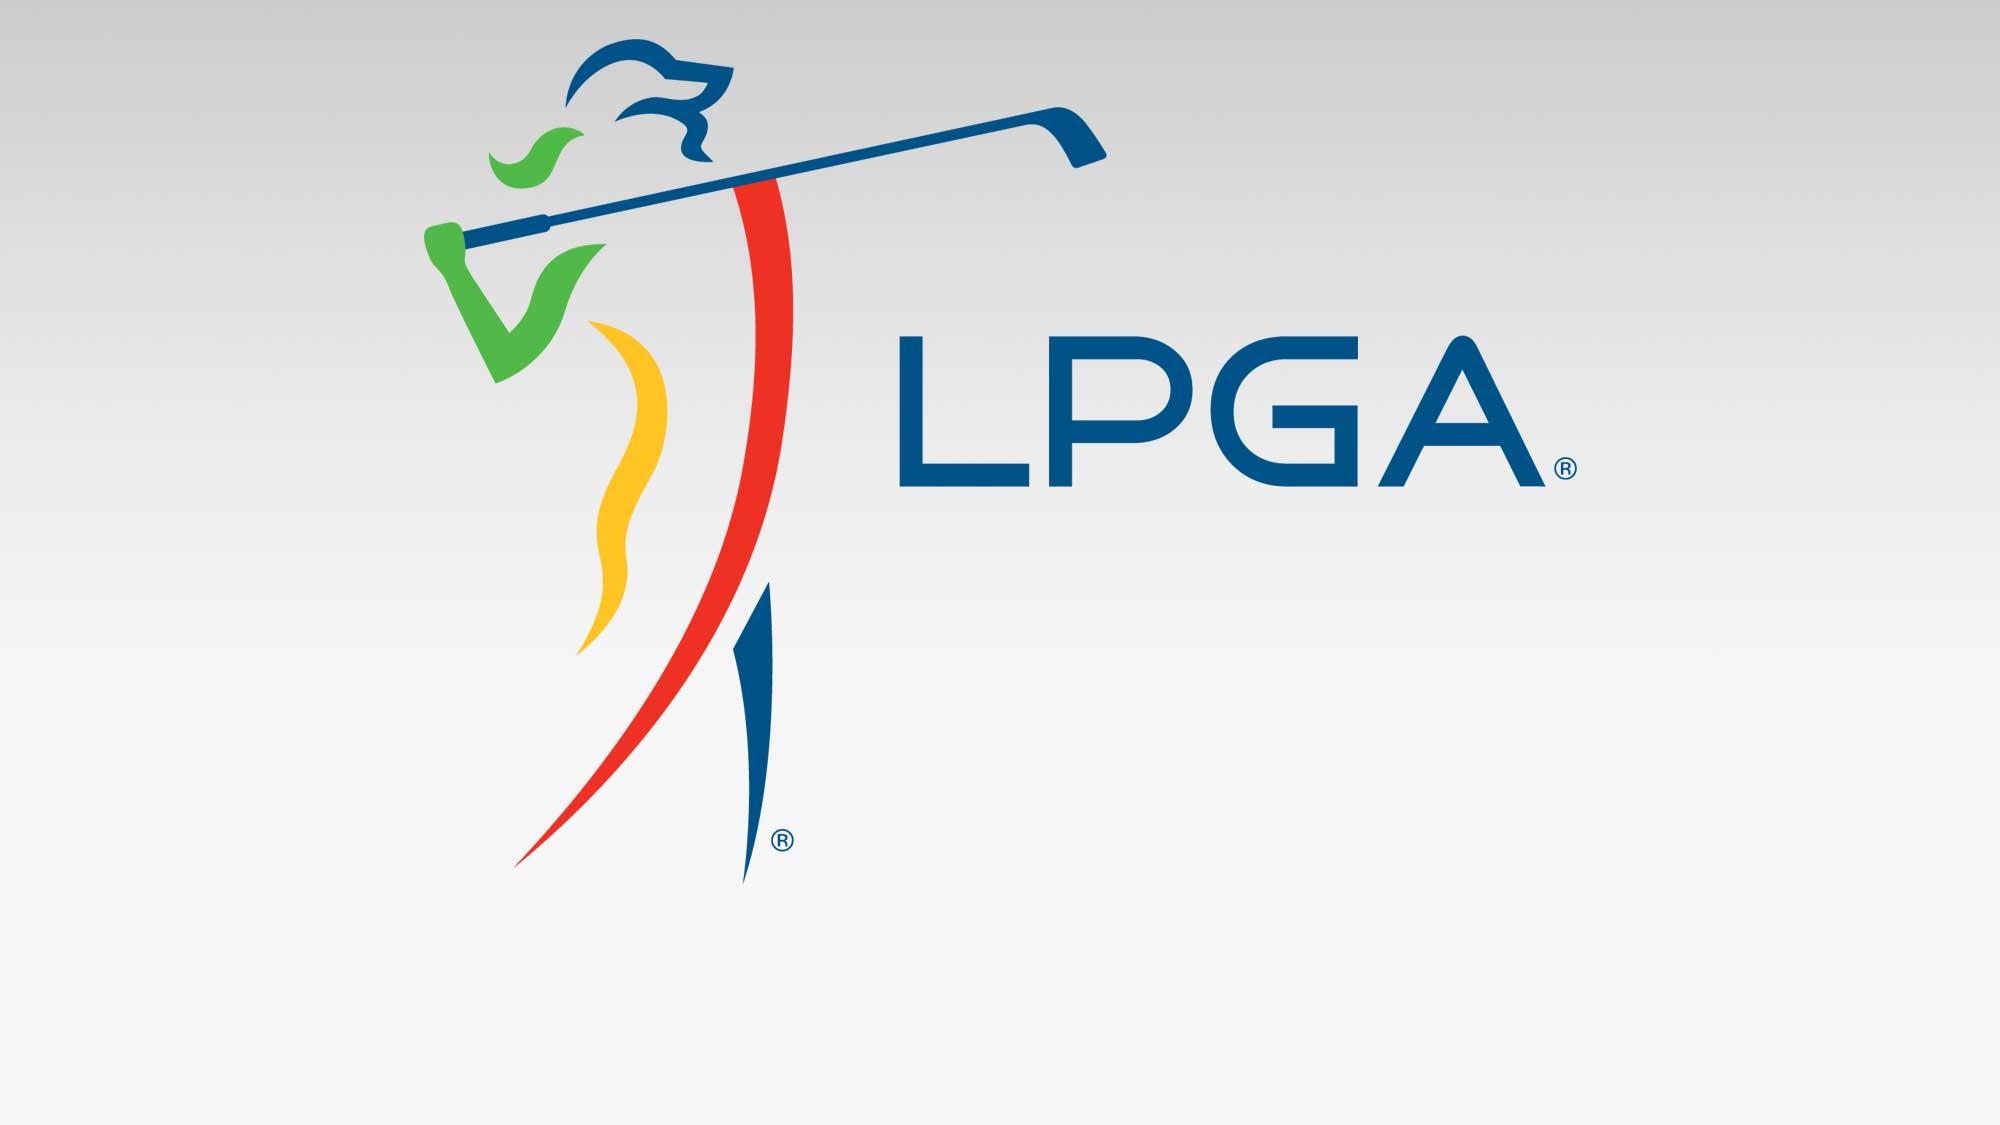 oneida nation to sponsor new lpga tour event in green bay